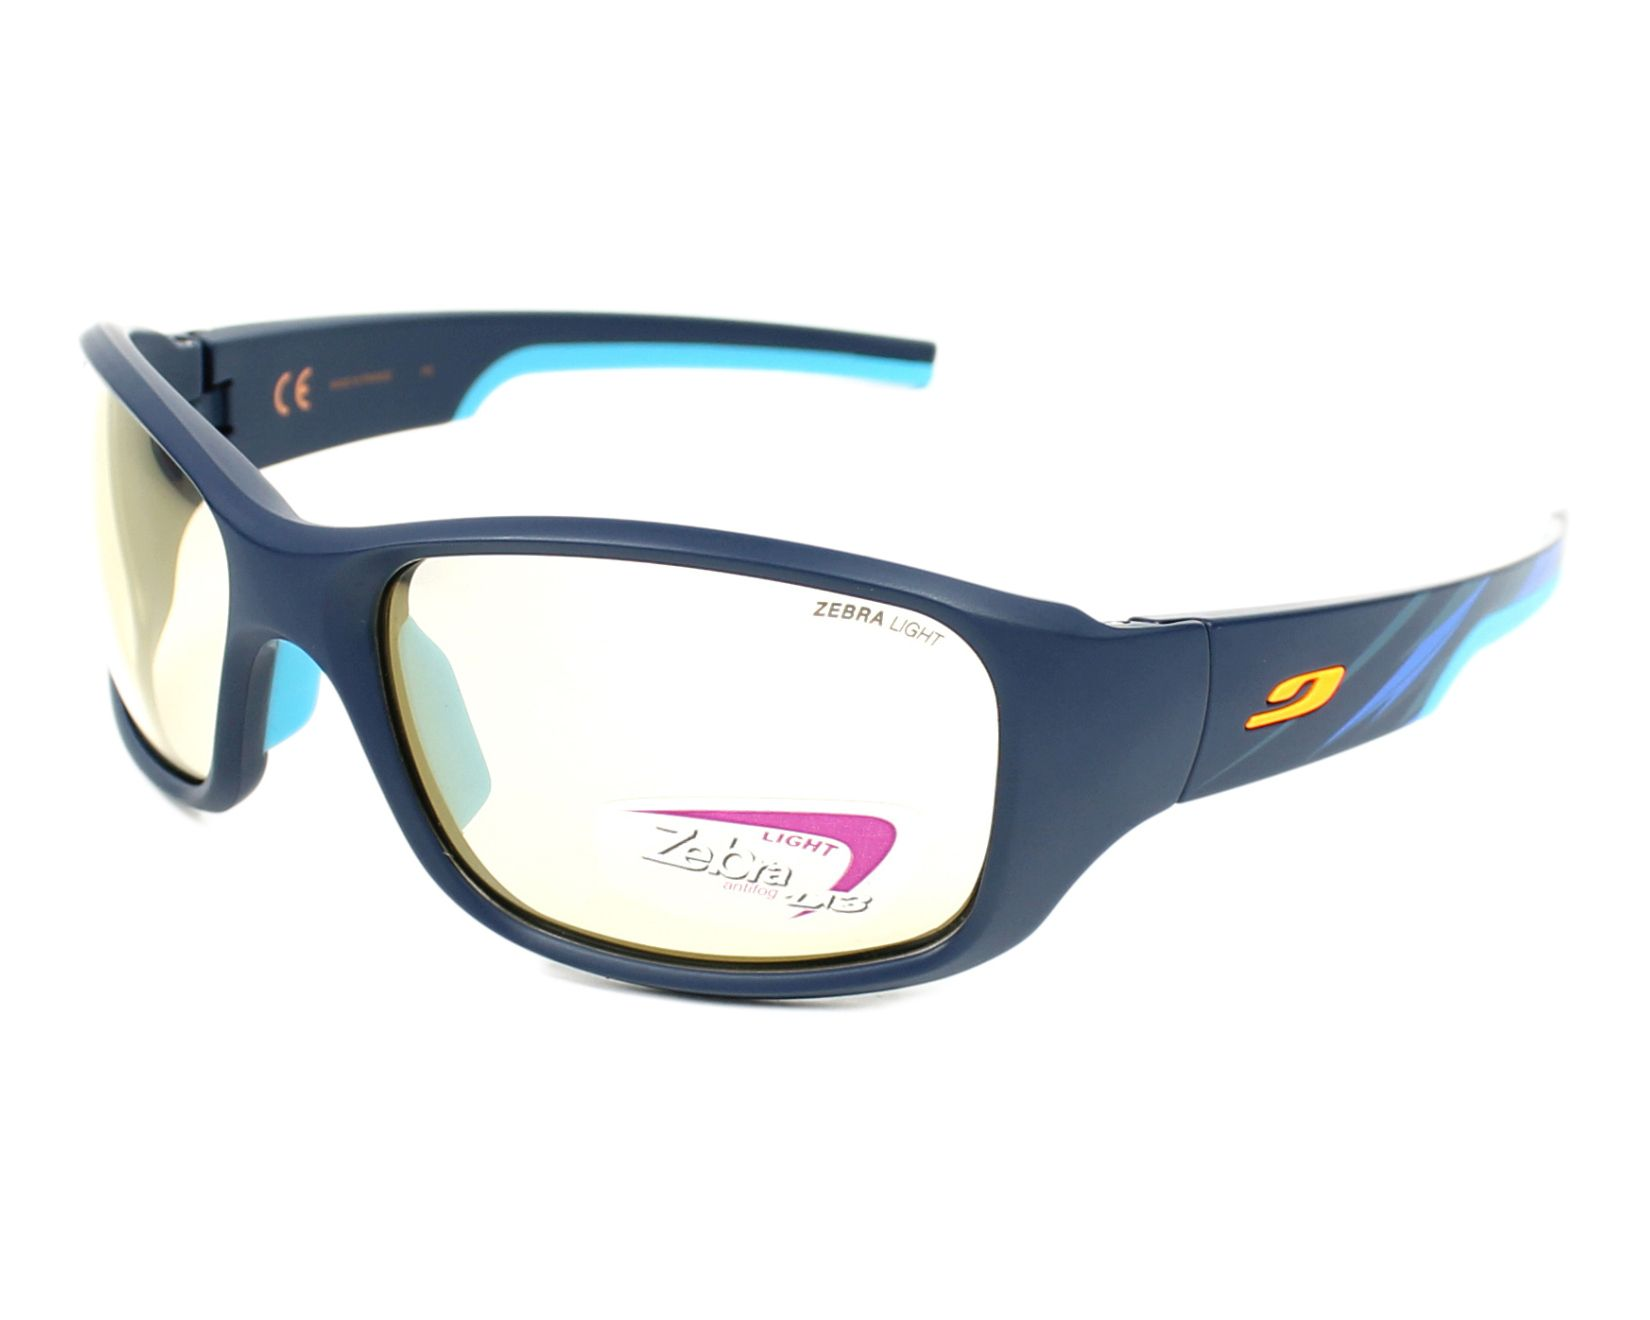 lunettes de soleil julbo j438 3132 bleu avec des verres jaune. Black Bedroom Furniture Sets. Home Design Ideas